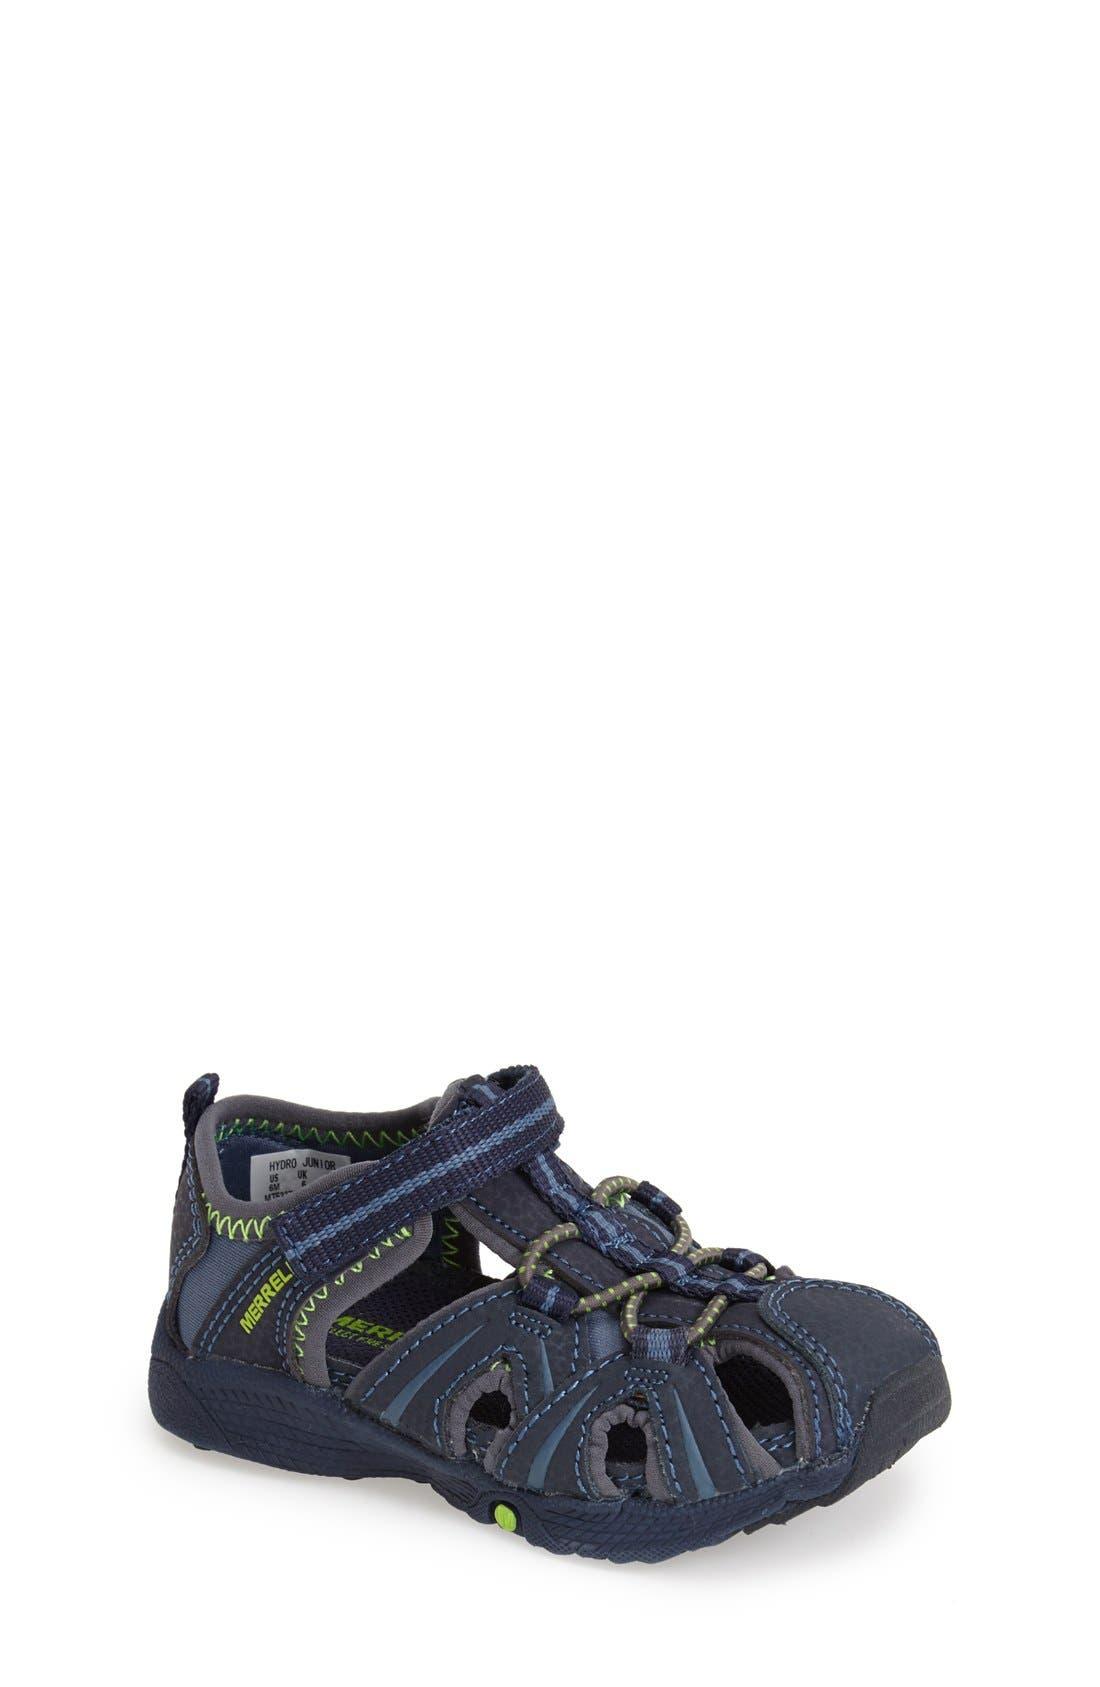 Toddler Merrell Hydro Junior MSelect Water Sandal